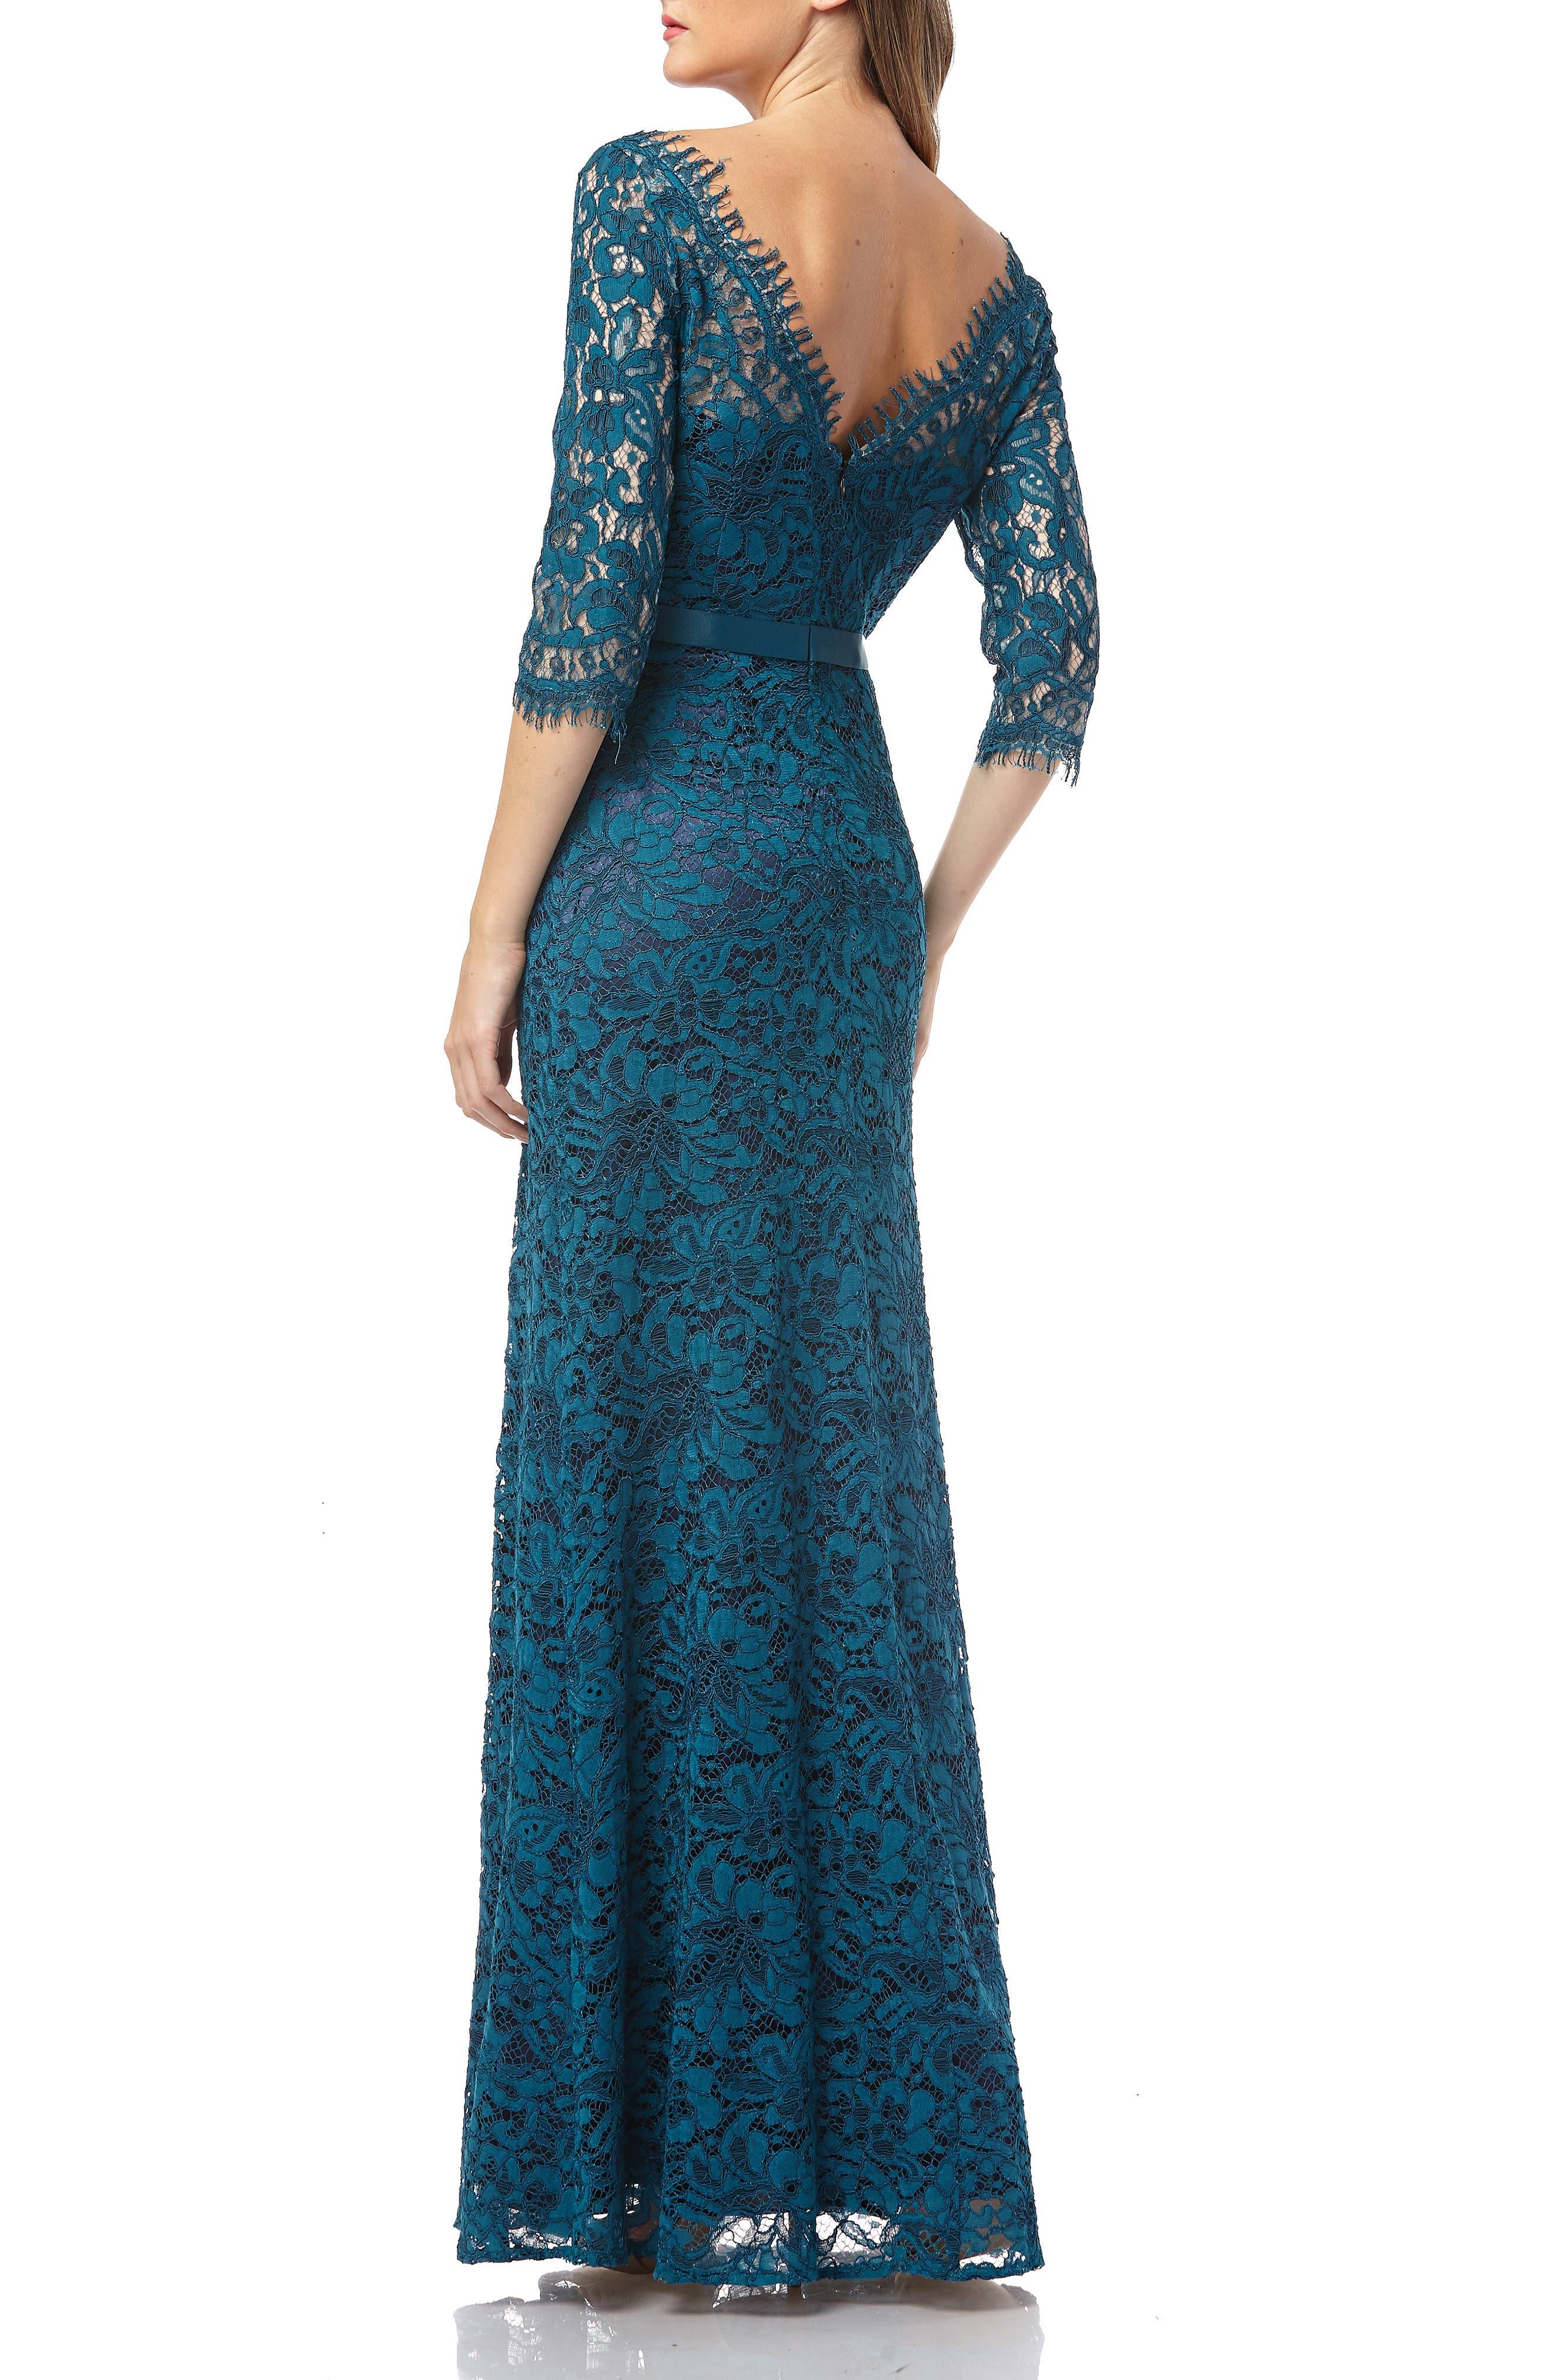 JS COLLECTIONS,                             Bateau Neck Lace Gown,                             Alternate thumbnail 2, color,                             TURQOISE NAVY